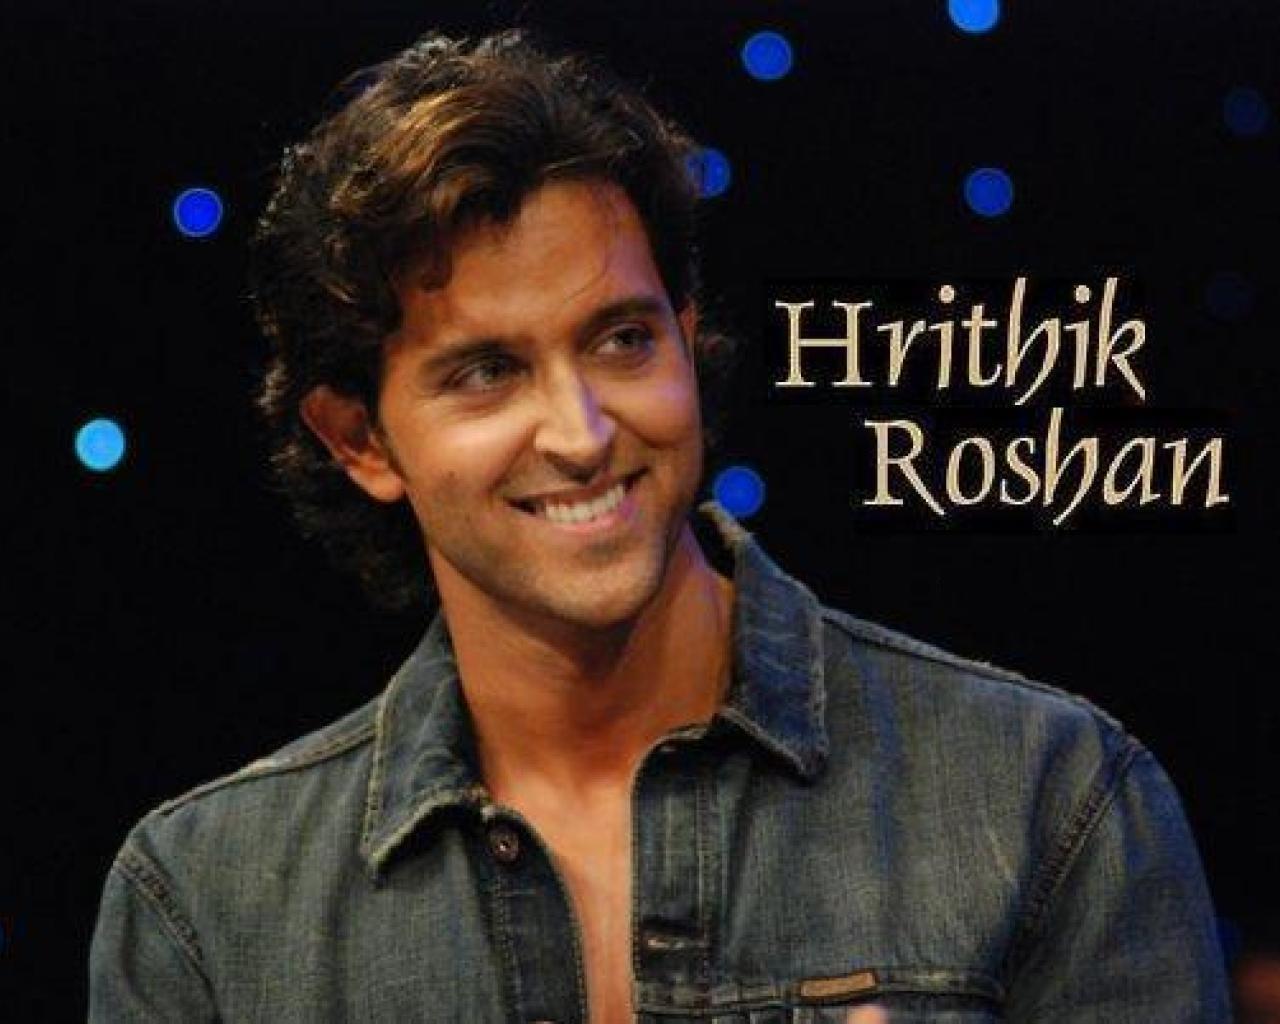 Hrithik roshan hd wallpapers free download - Hrithik roshan image download ...